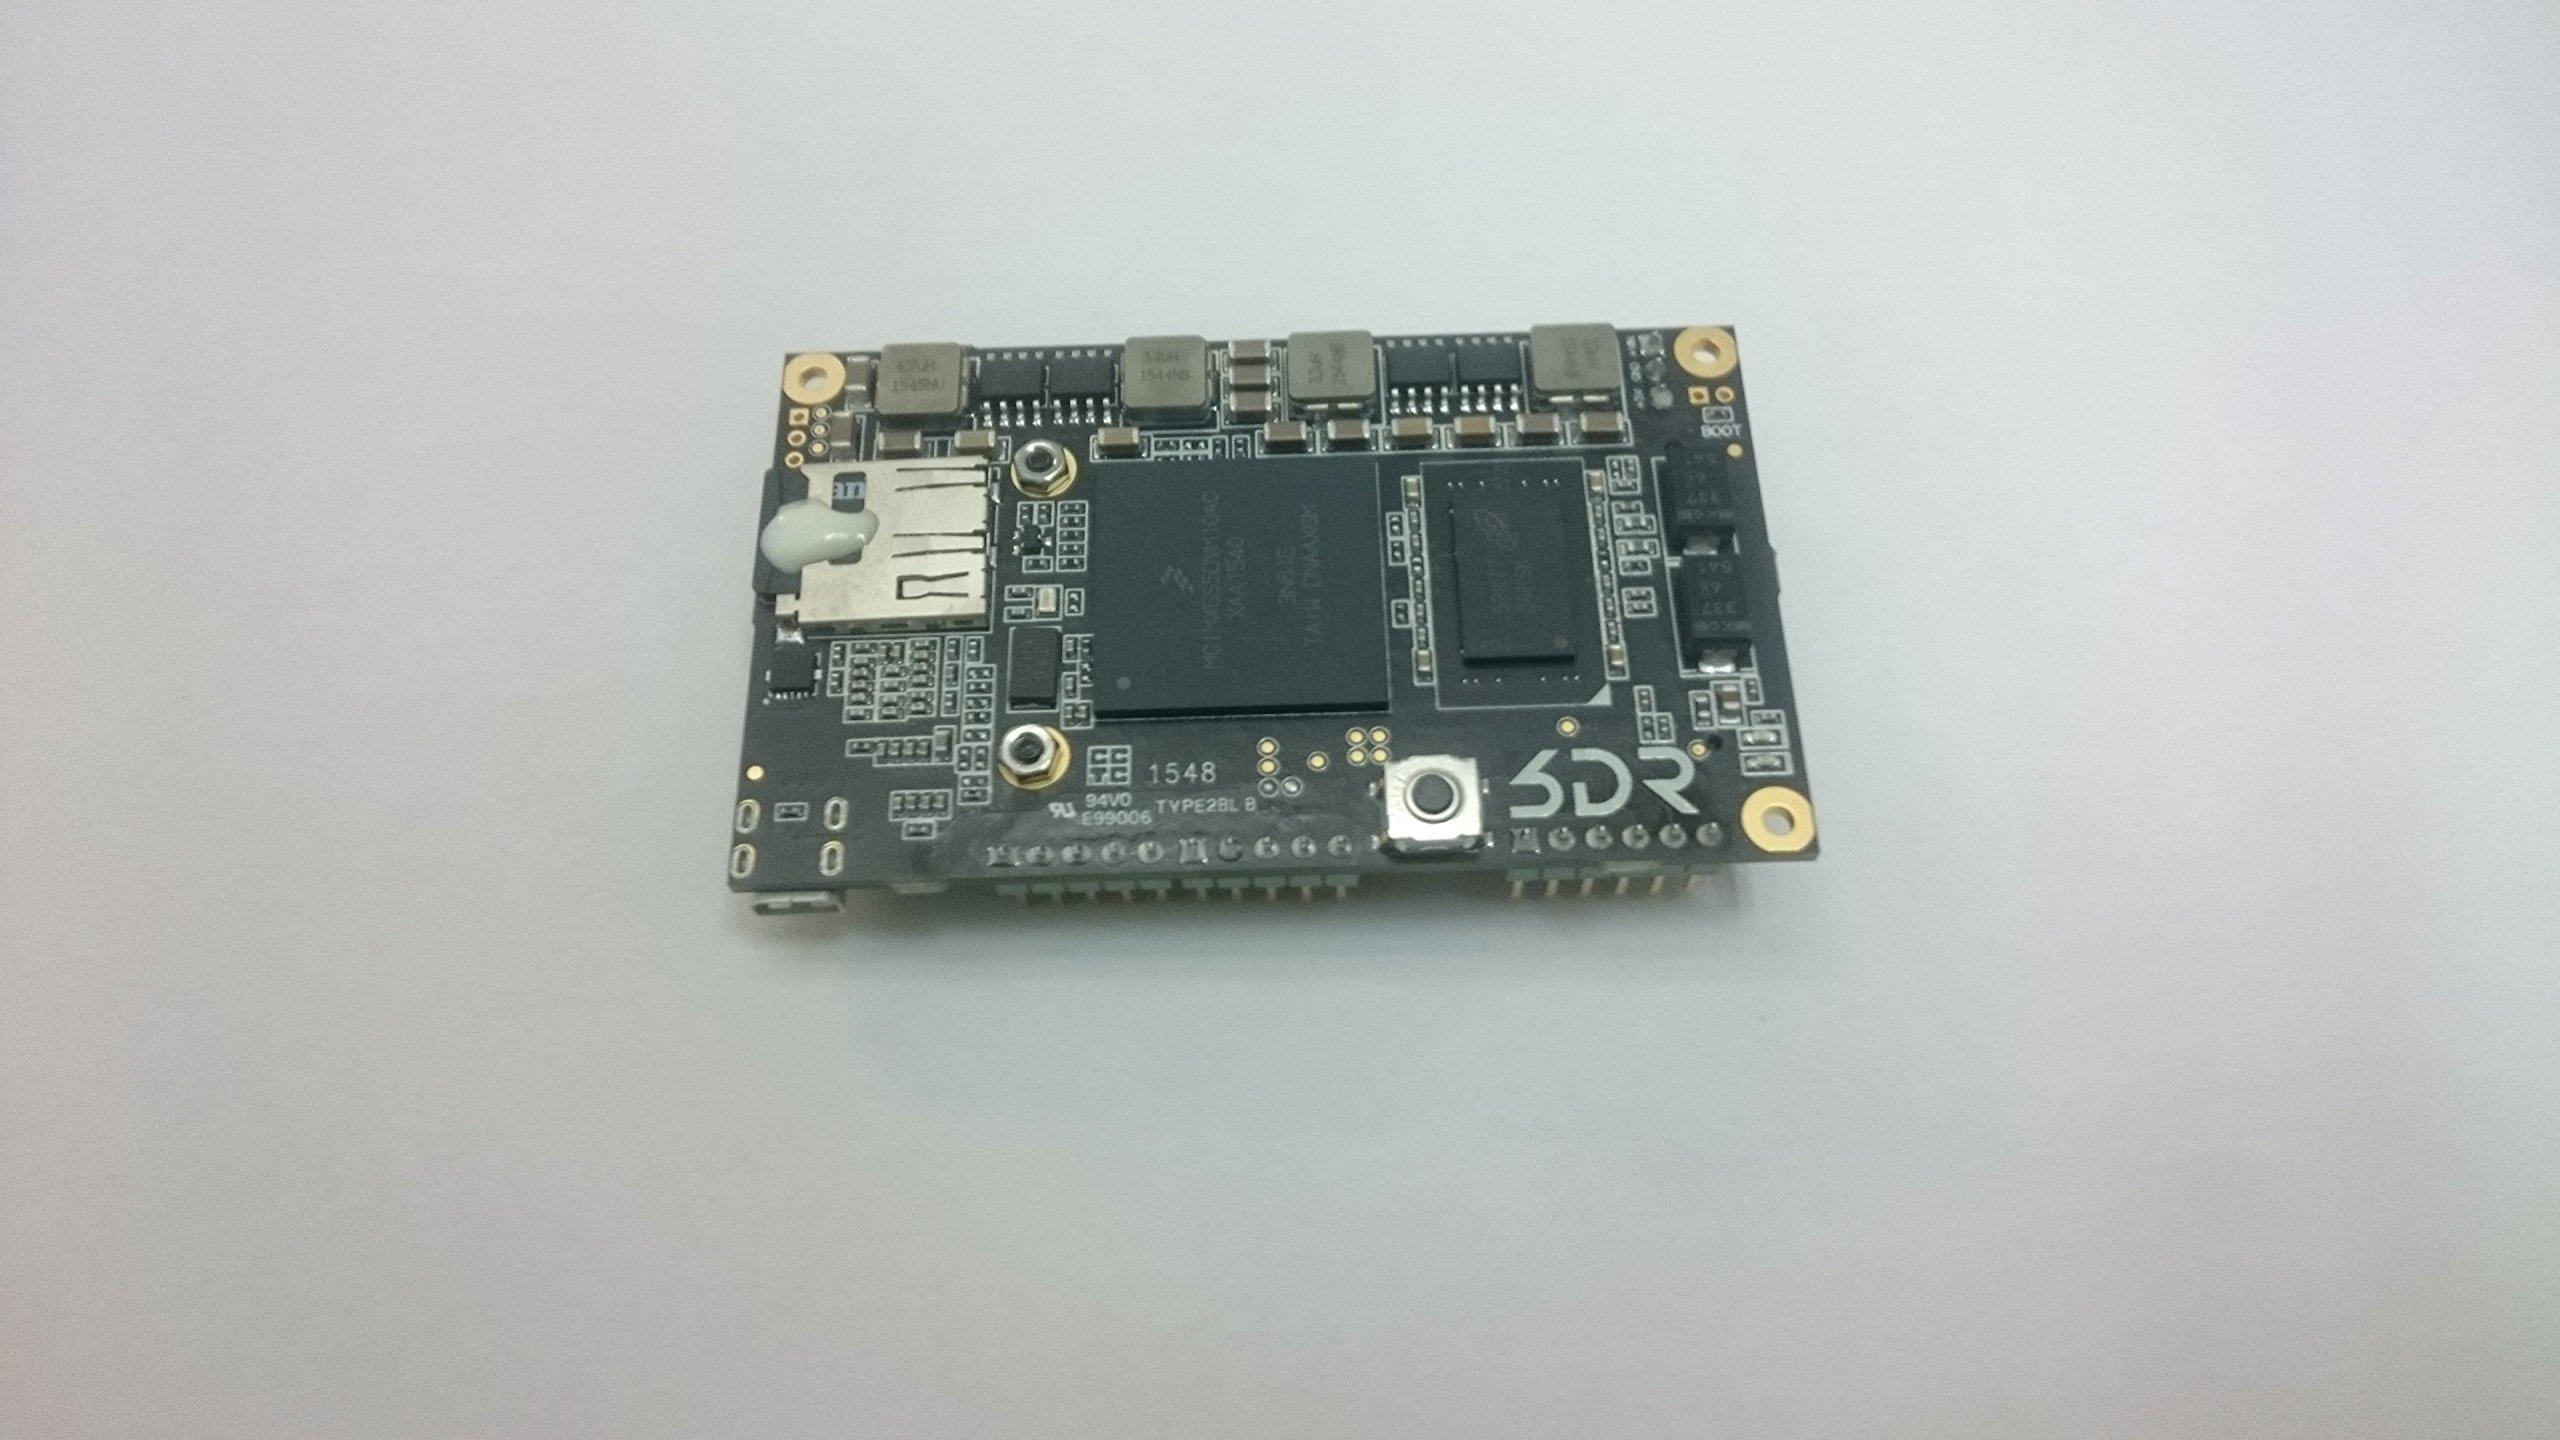 3D Robotics Solo Link Imx6 Board Camera Remote Control, Black